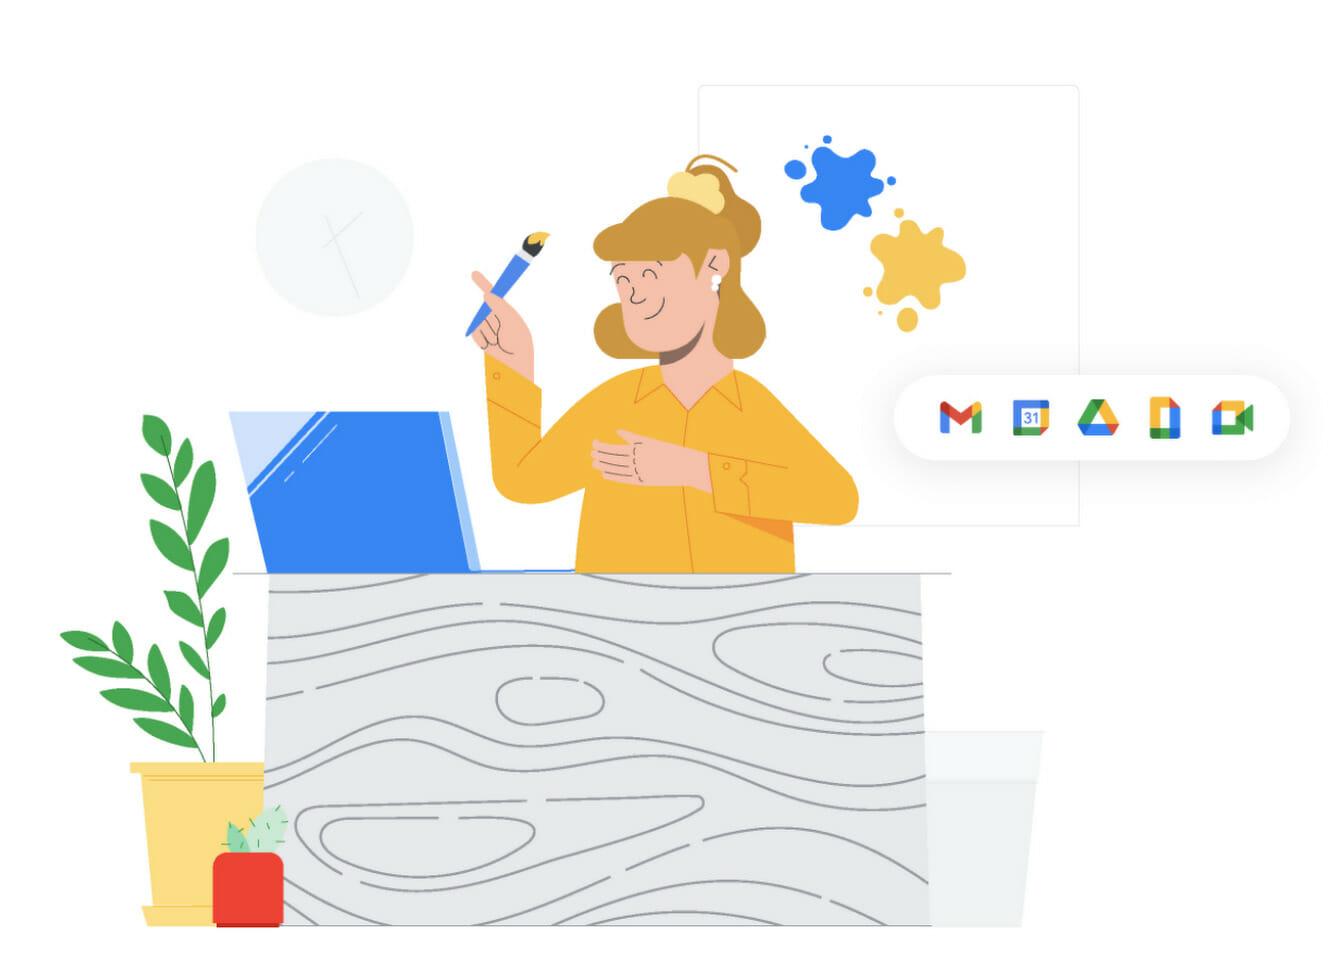 [Google for Education] Technology Partners Forum 2021 Google for Education と ICT ツールを使用した学び